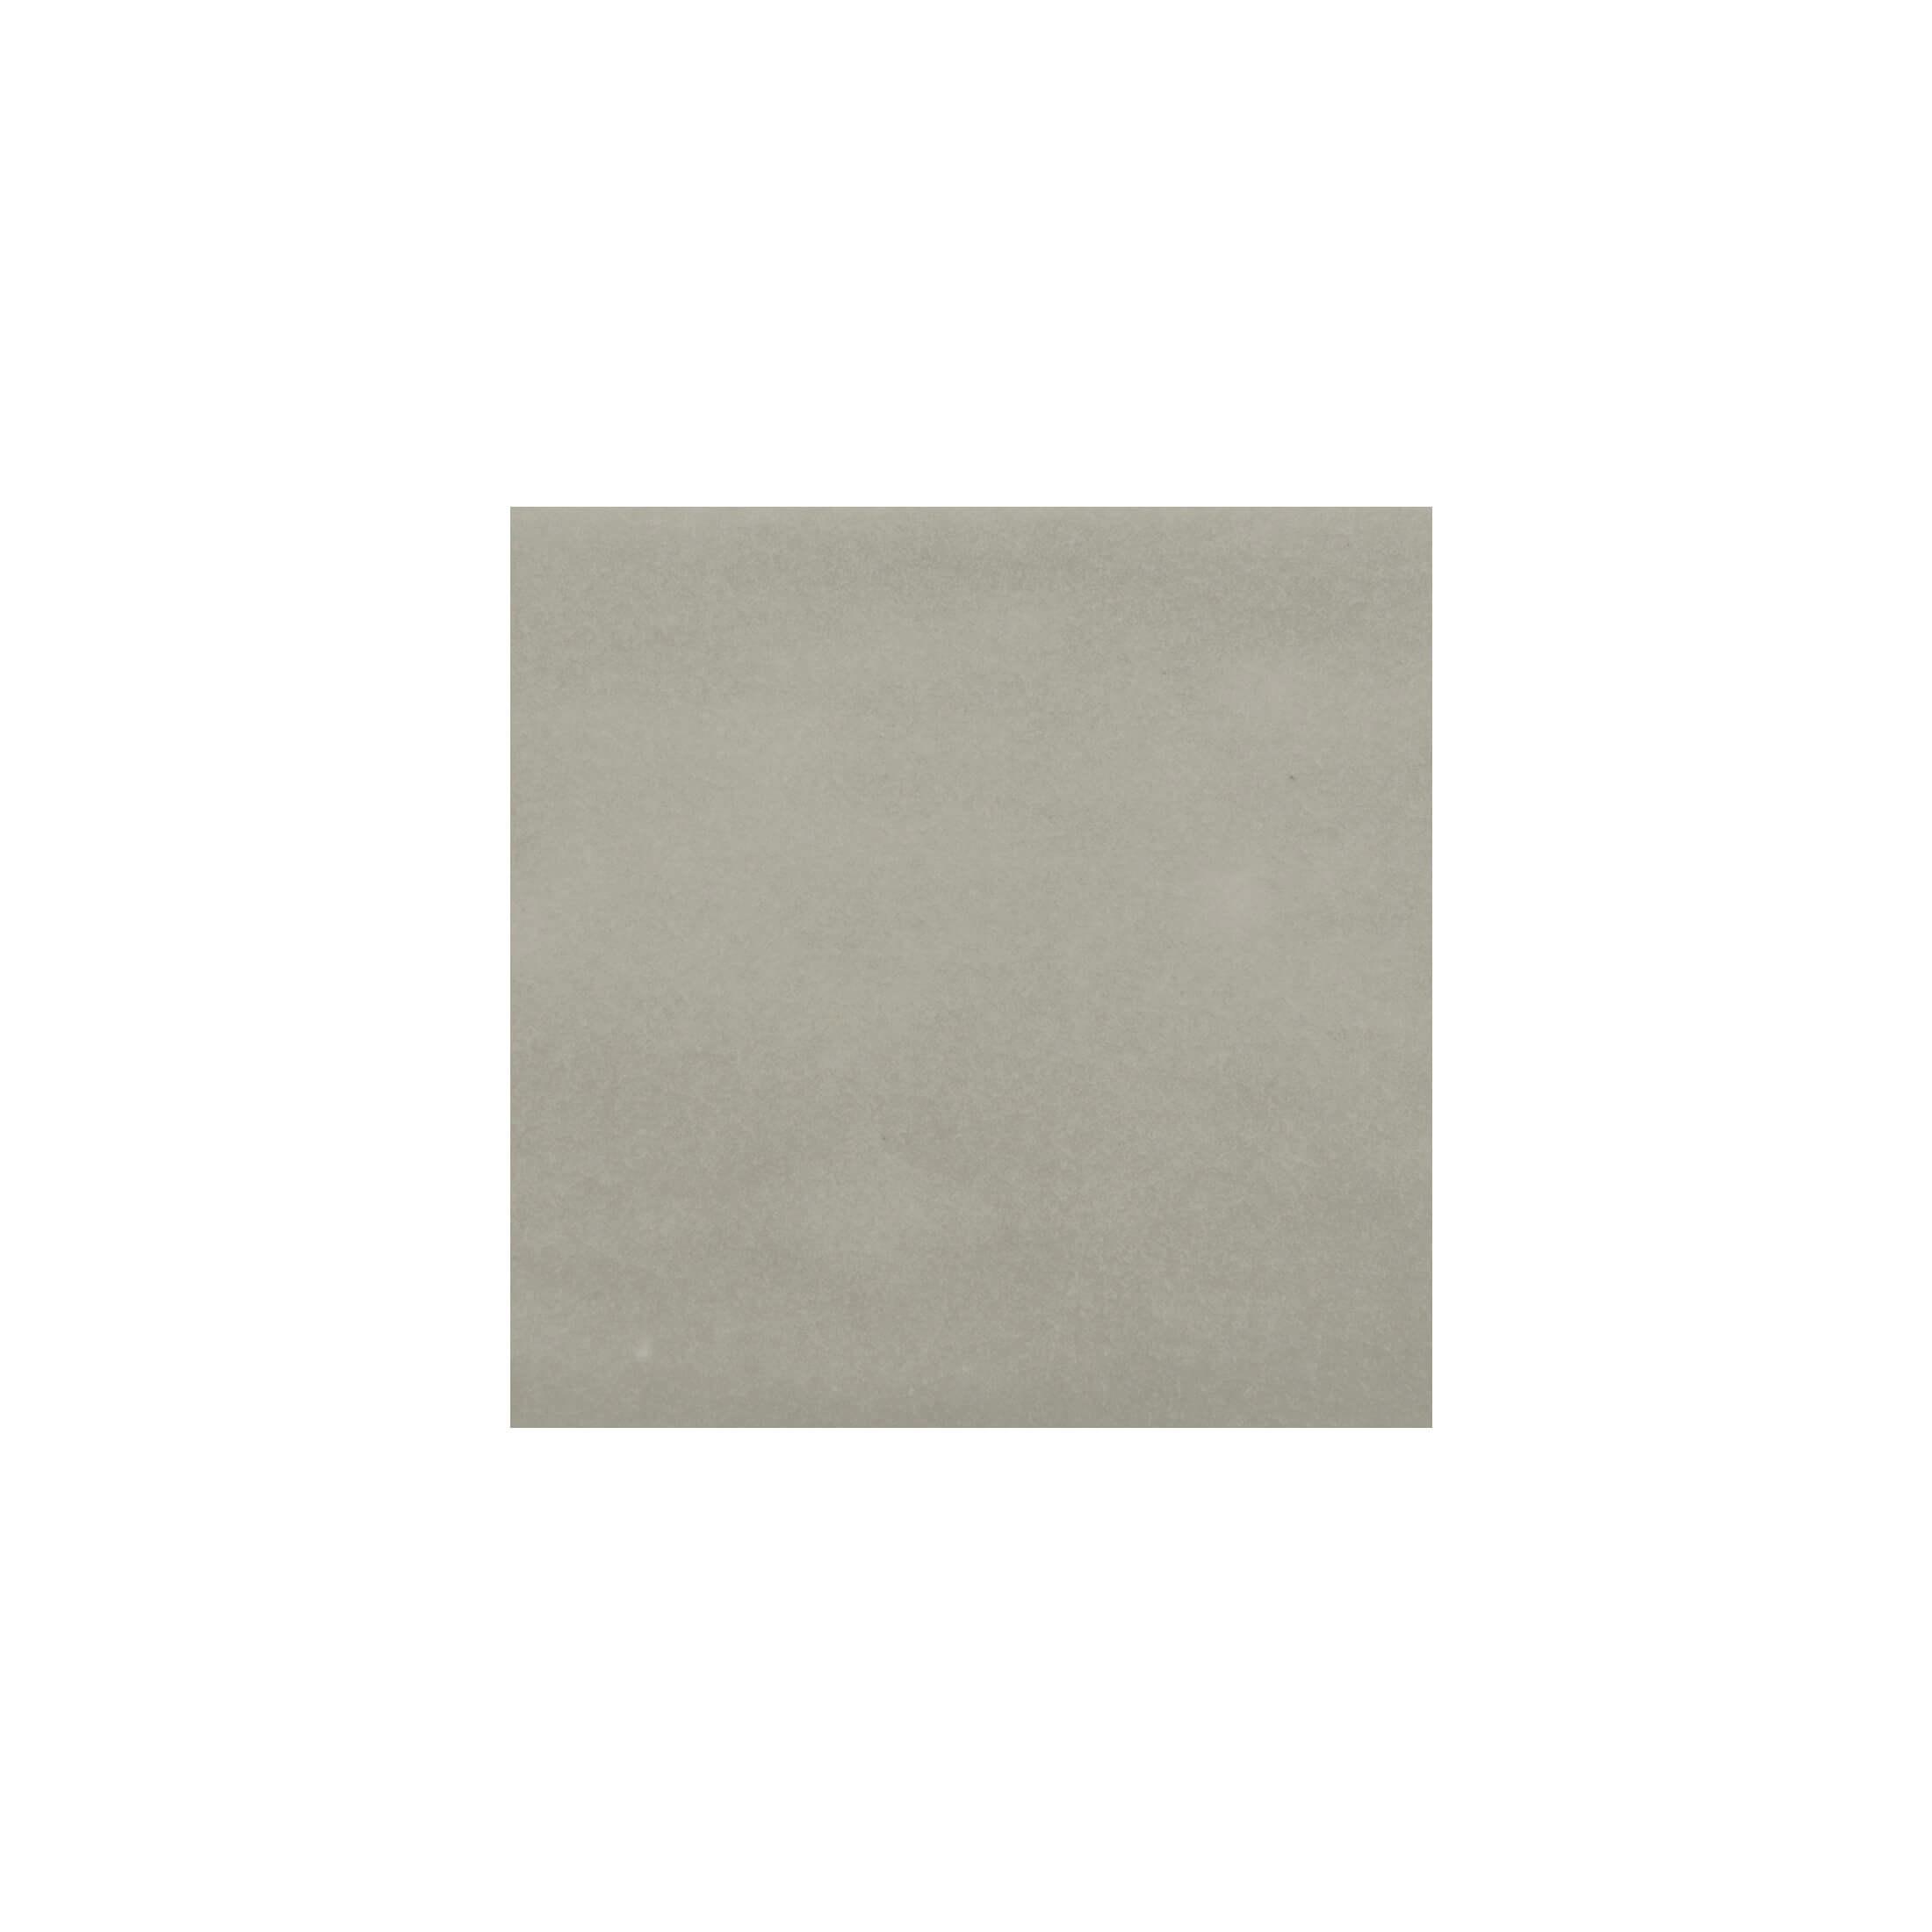 ADNT1003 - LISO  - 15 cm X 15 cm